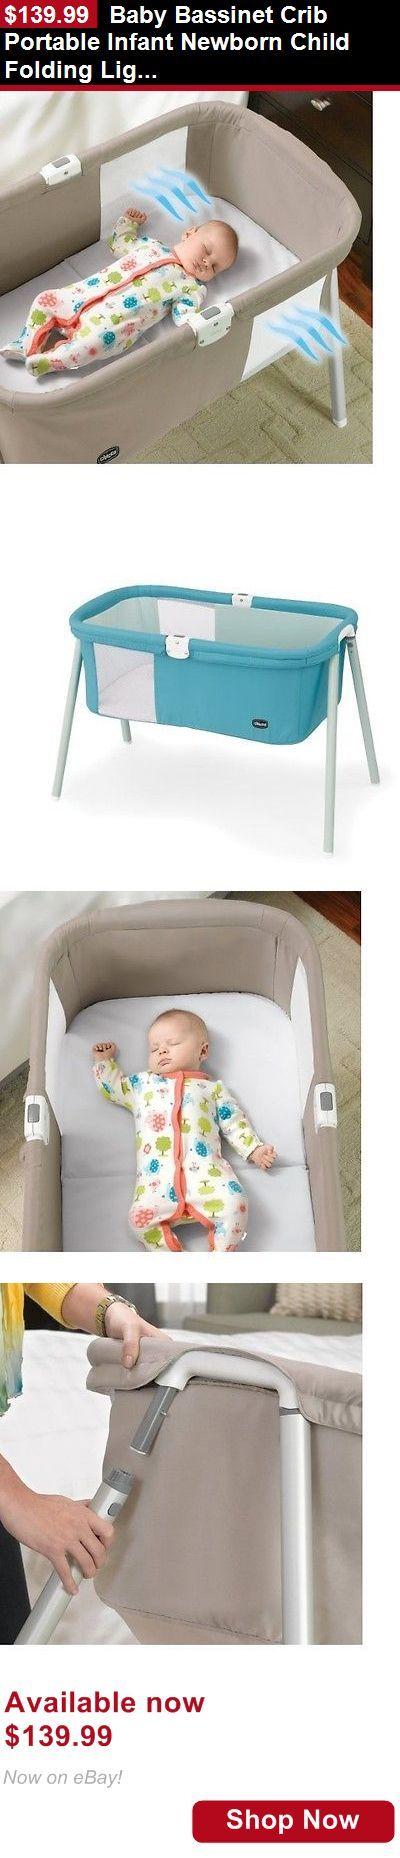 Baby Co Sleepers Bassinet Crib Portable Infant Newborn Child Folding Lightheight Furniture BUY